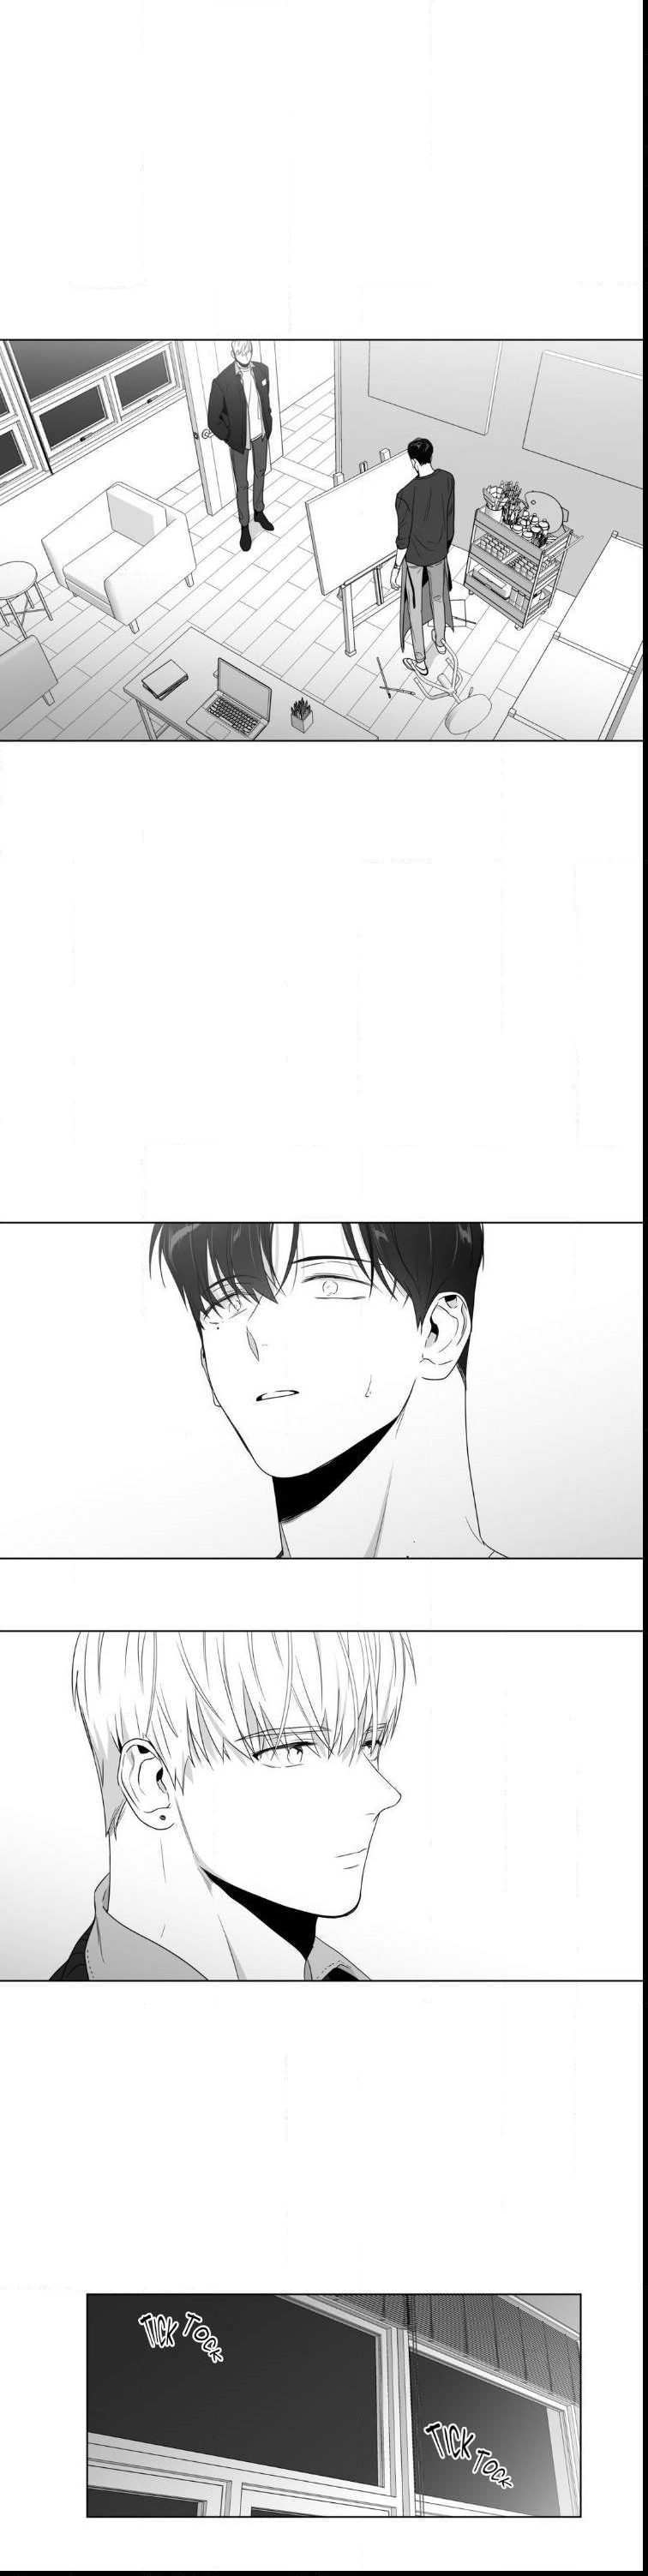 Read Lover Boy Lezhin Manga English New Chapters Online Free Mangaclash